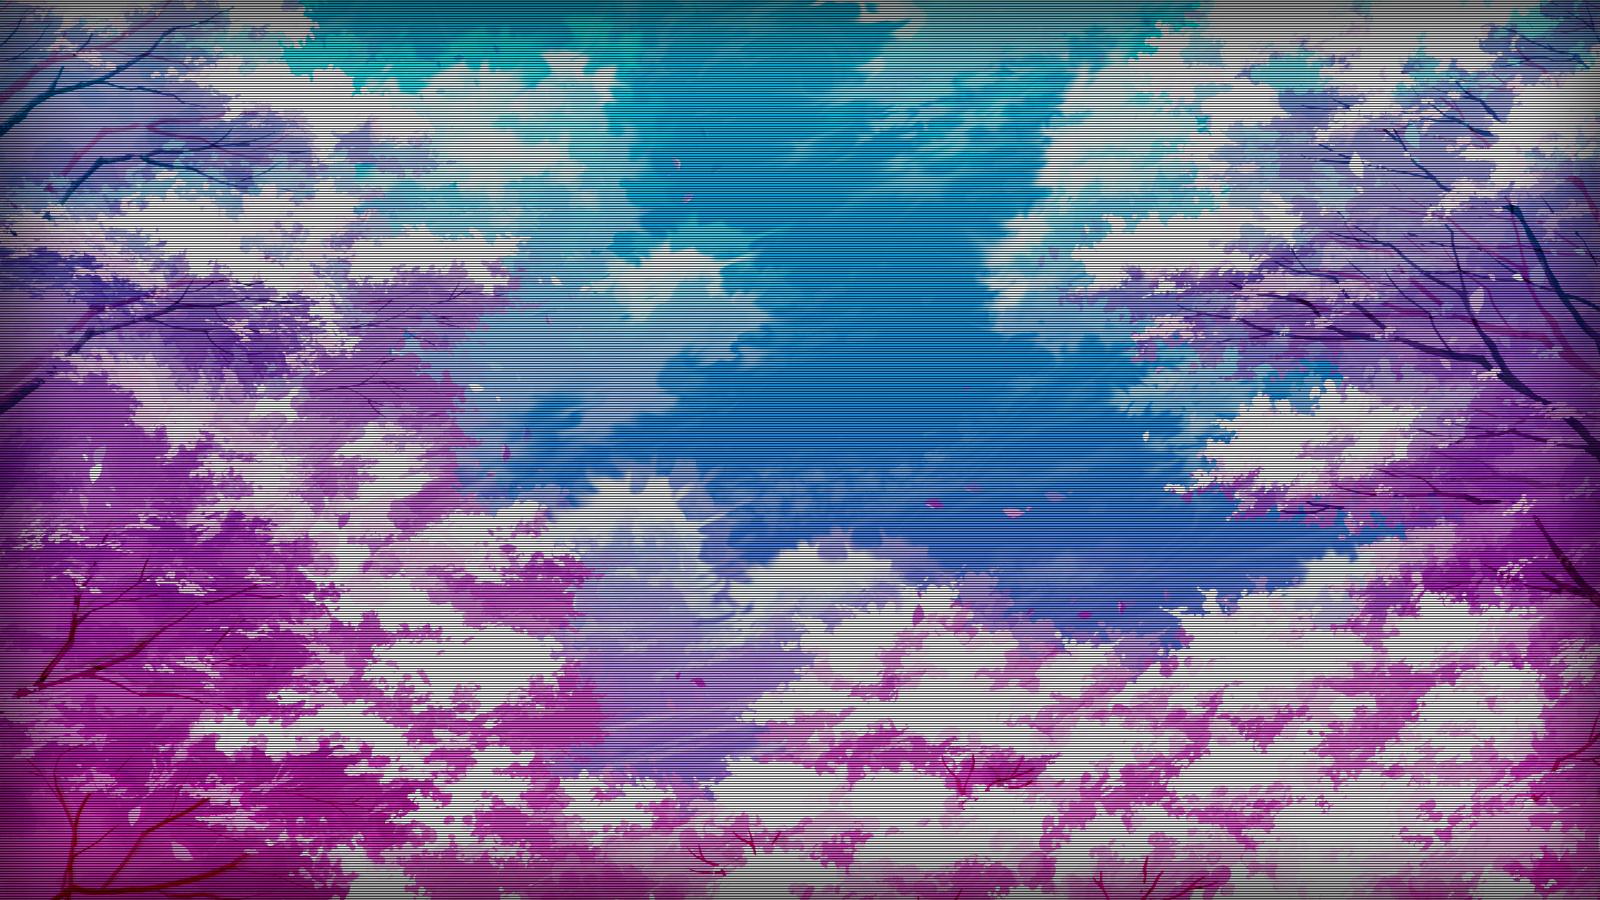 Wallpaper : edit, vaporwave, artwork, digital art, trees ...